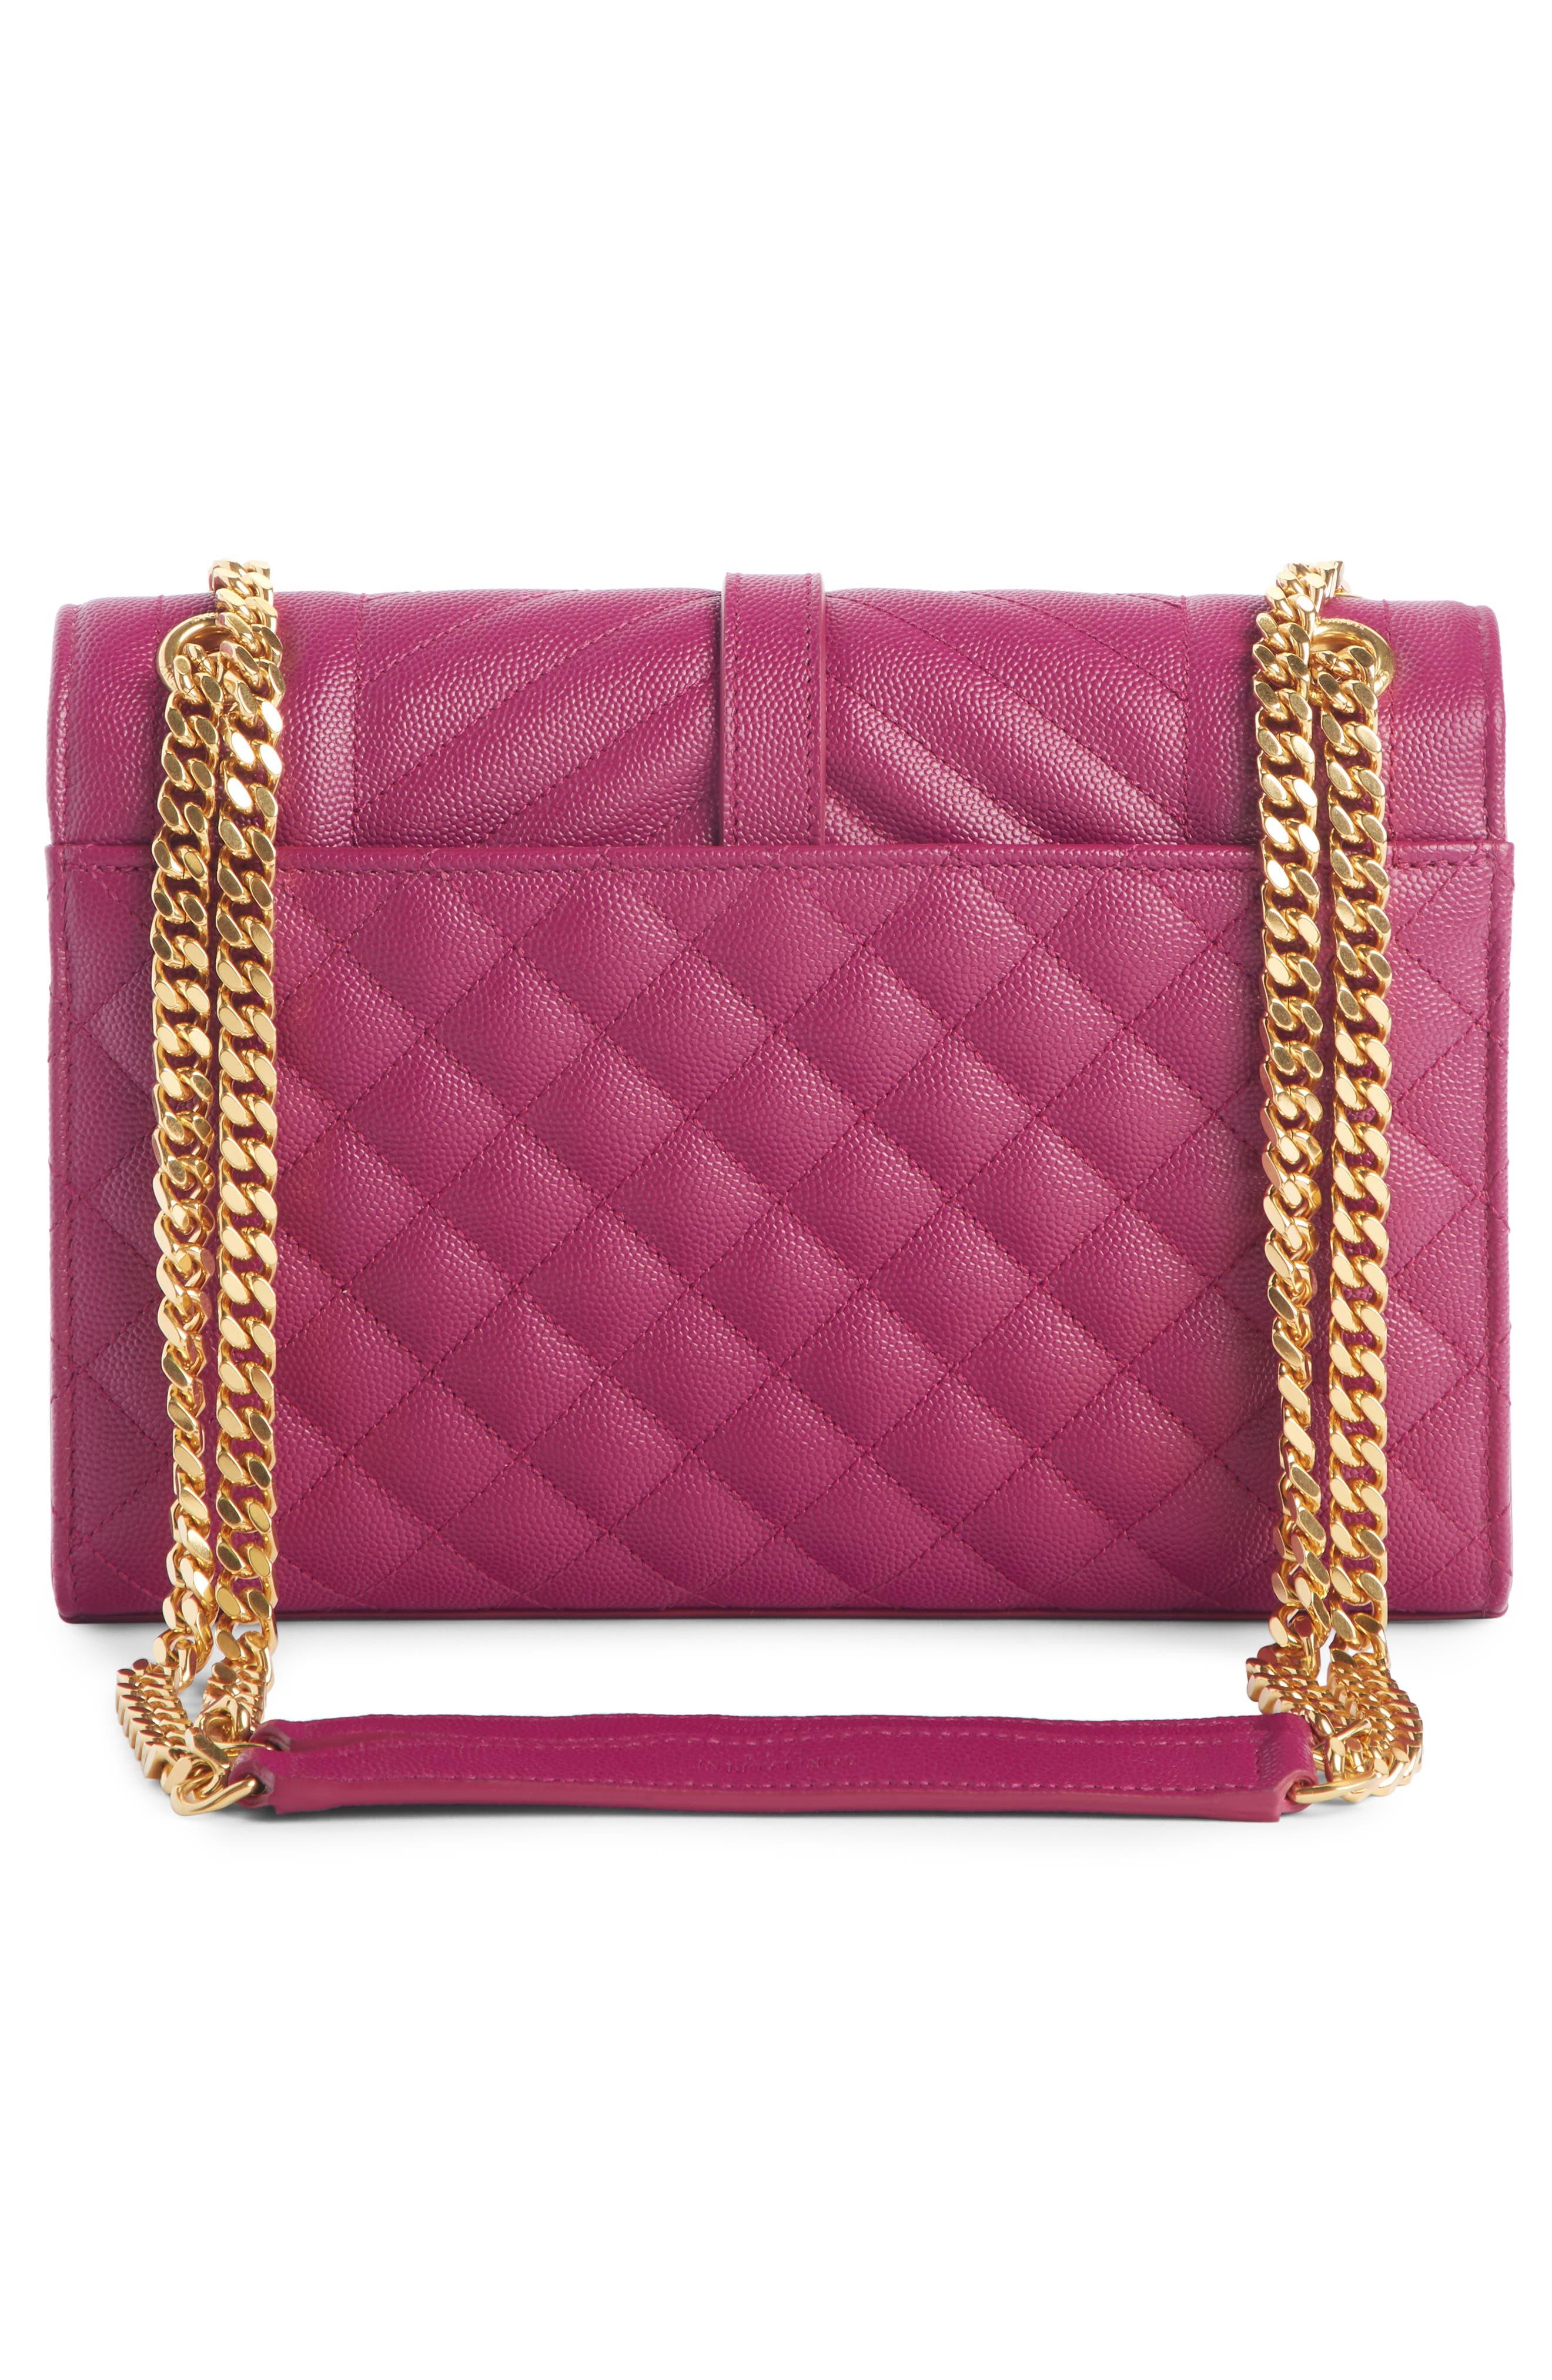 SAINT LAURENT, Medium Cassandre Calfskin Shoulder Bag, Alternate thumbnail 3, color, DARK GRAPE